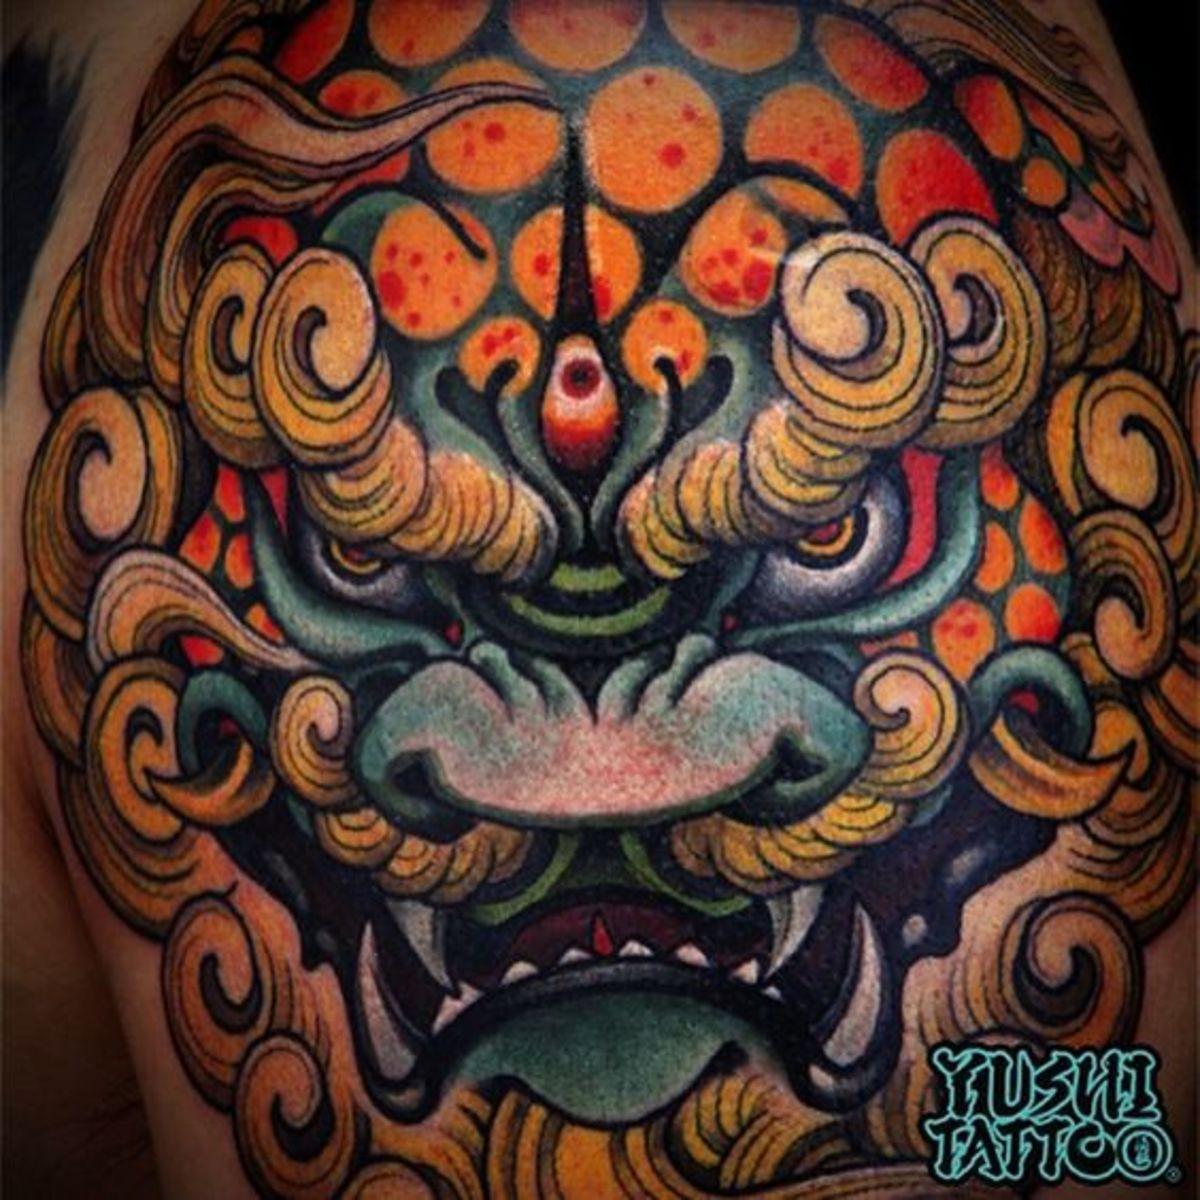 Shi shi/Stone Lion tattoo.